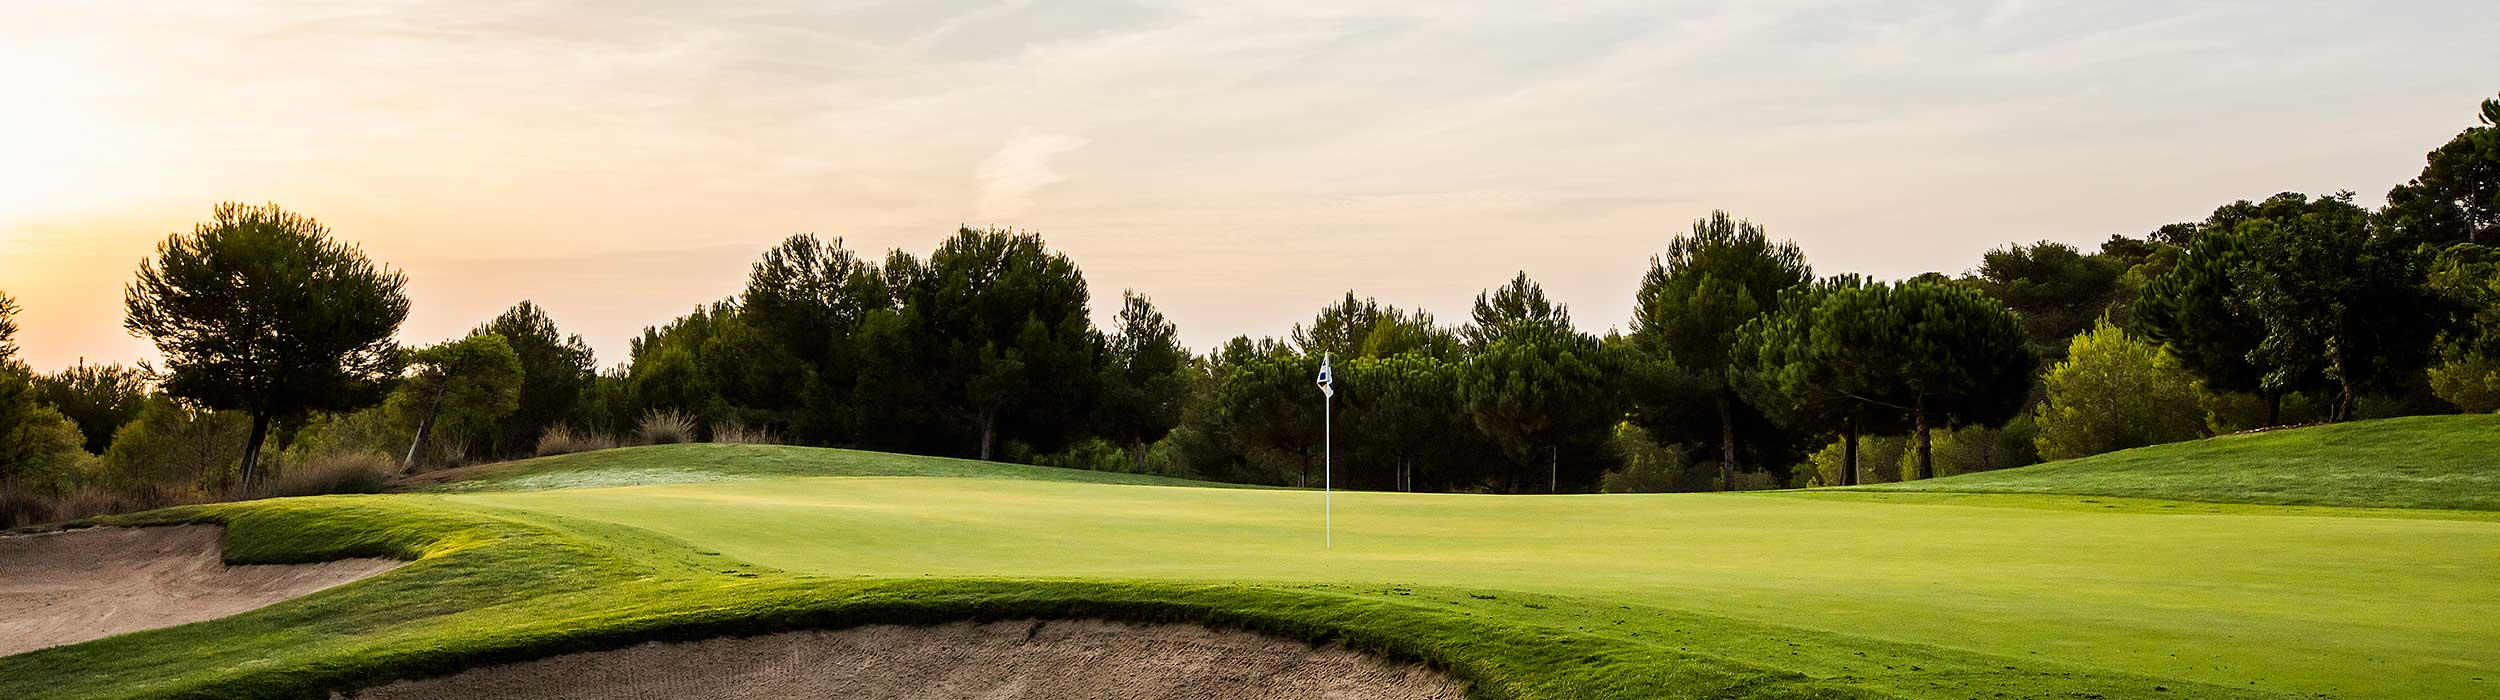 Golfbana Stockholm